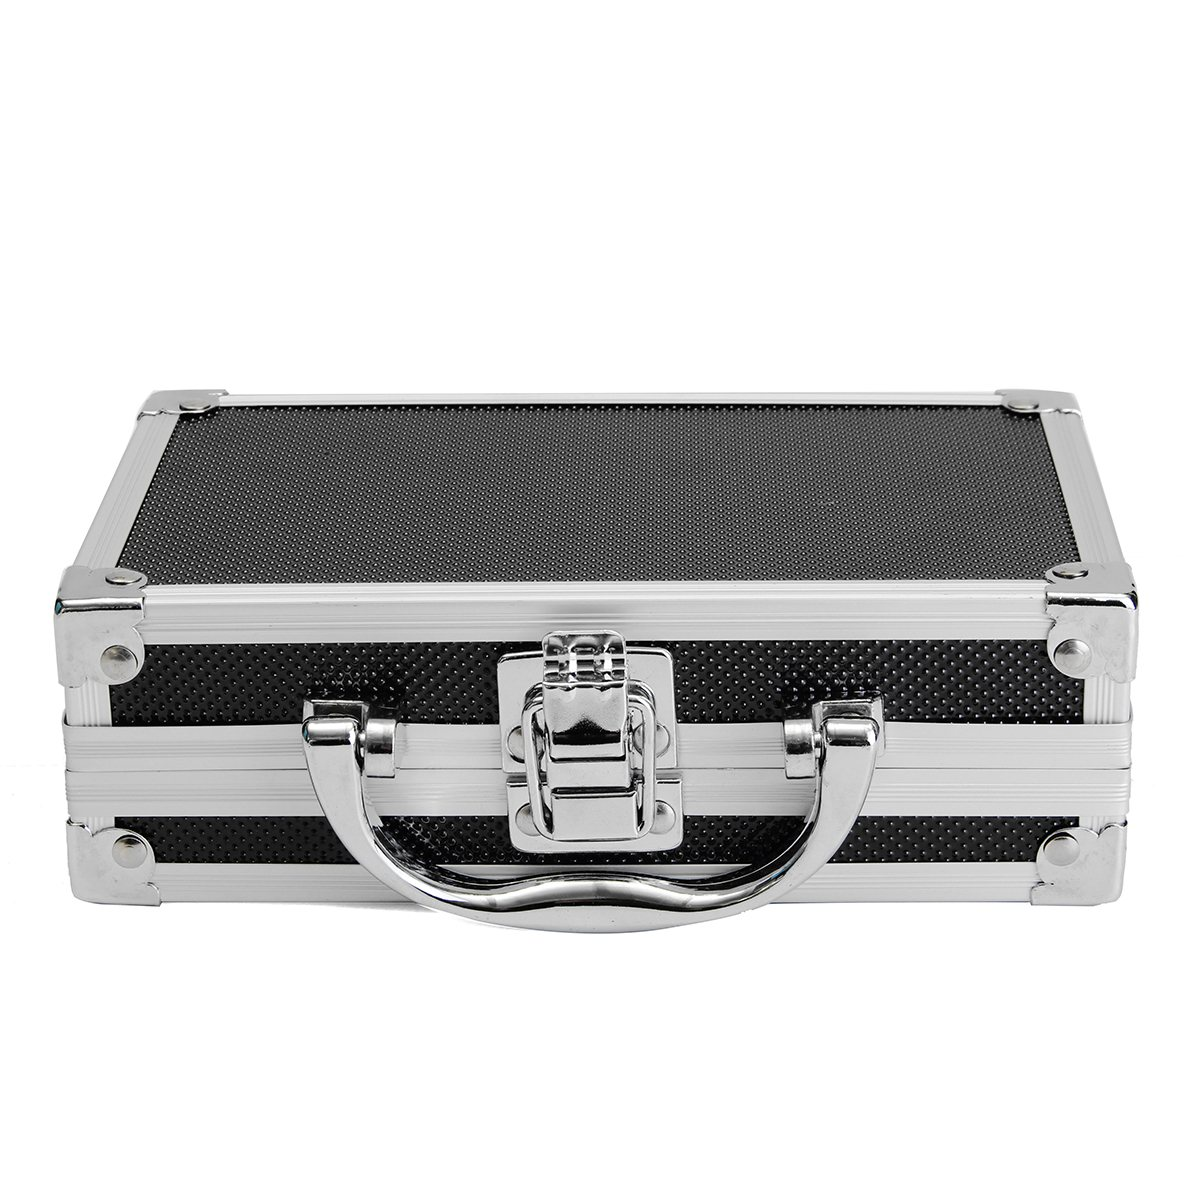 Aluminium Alloy Tool Box Handle Storage Suitcase Travel Luggage Organizer Case